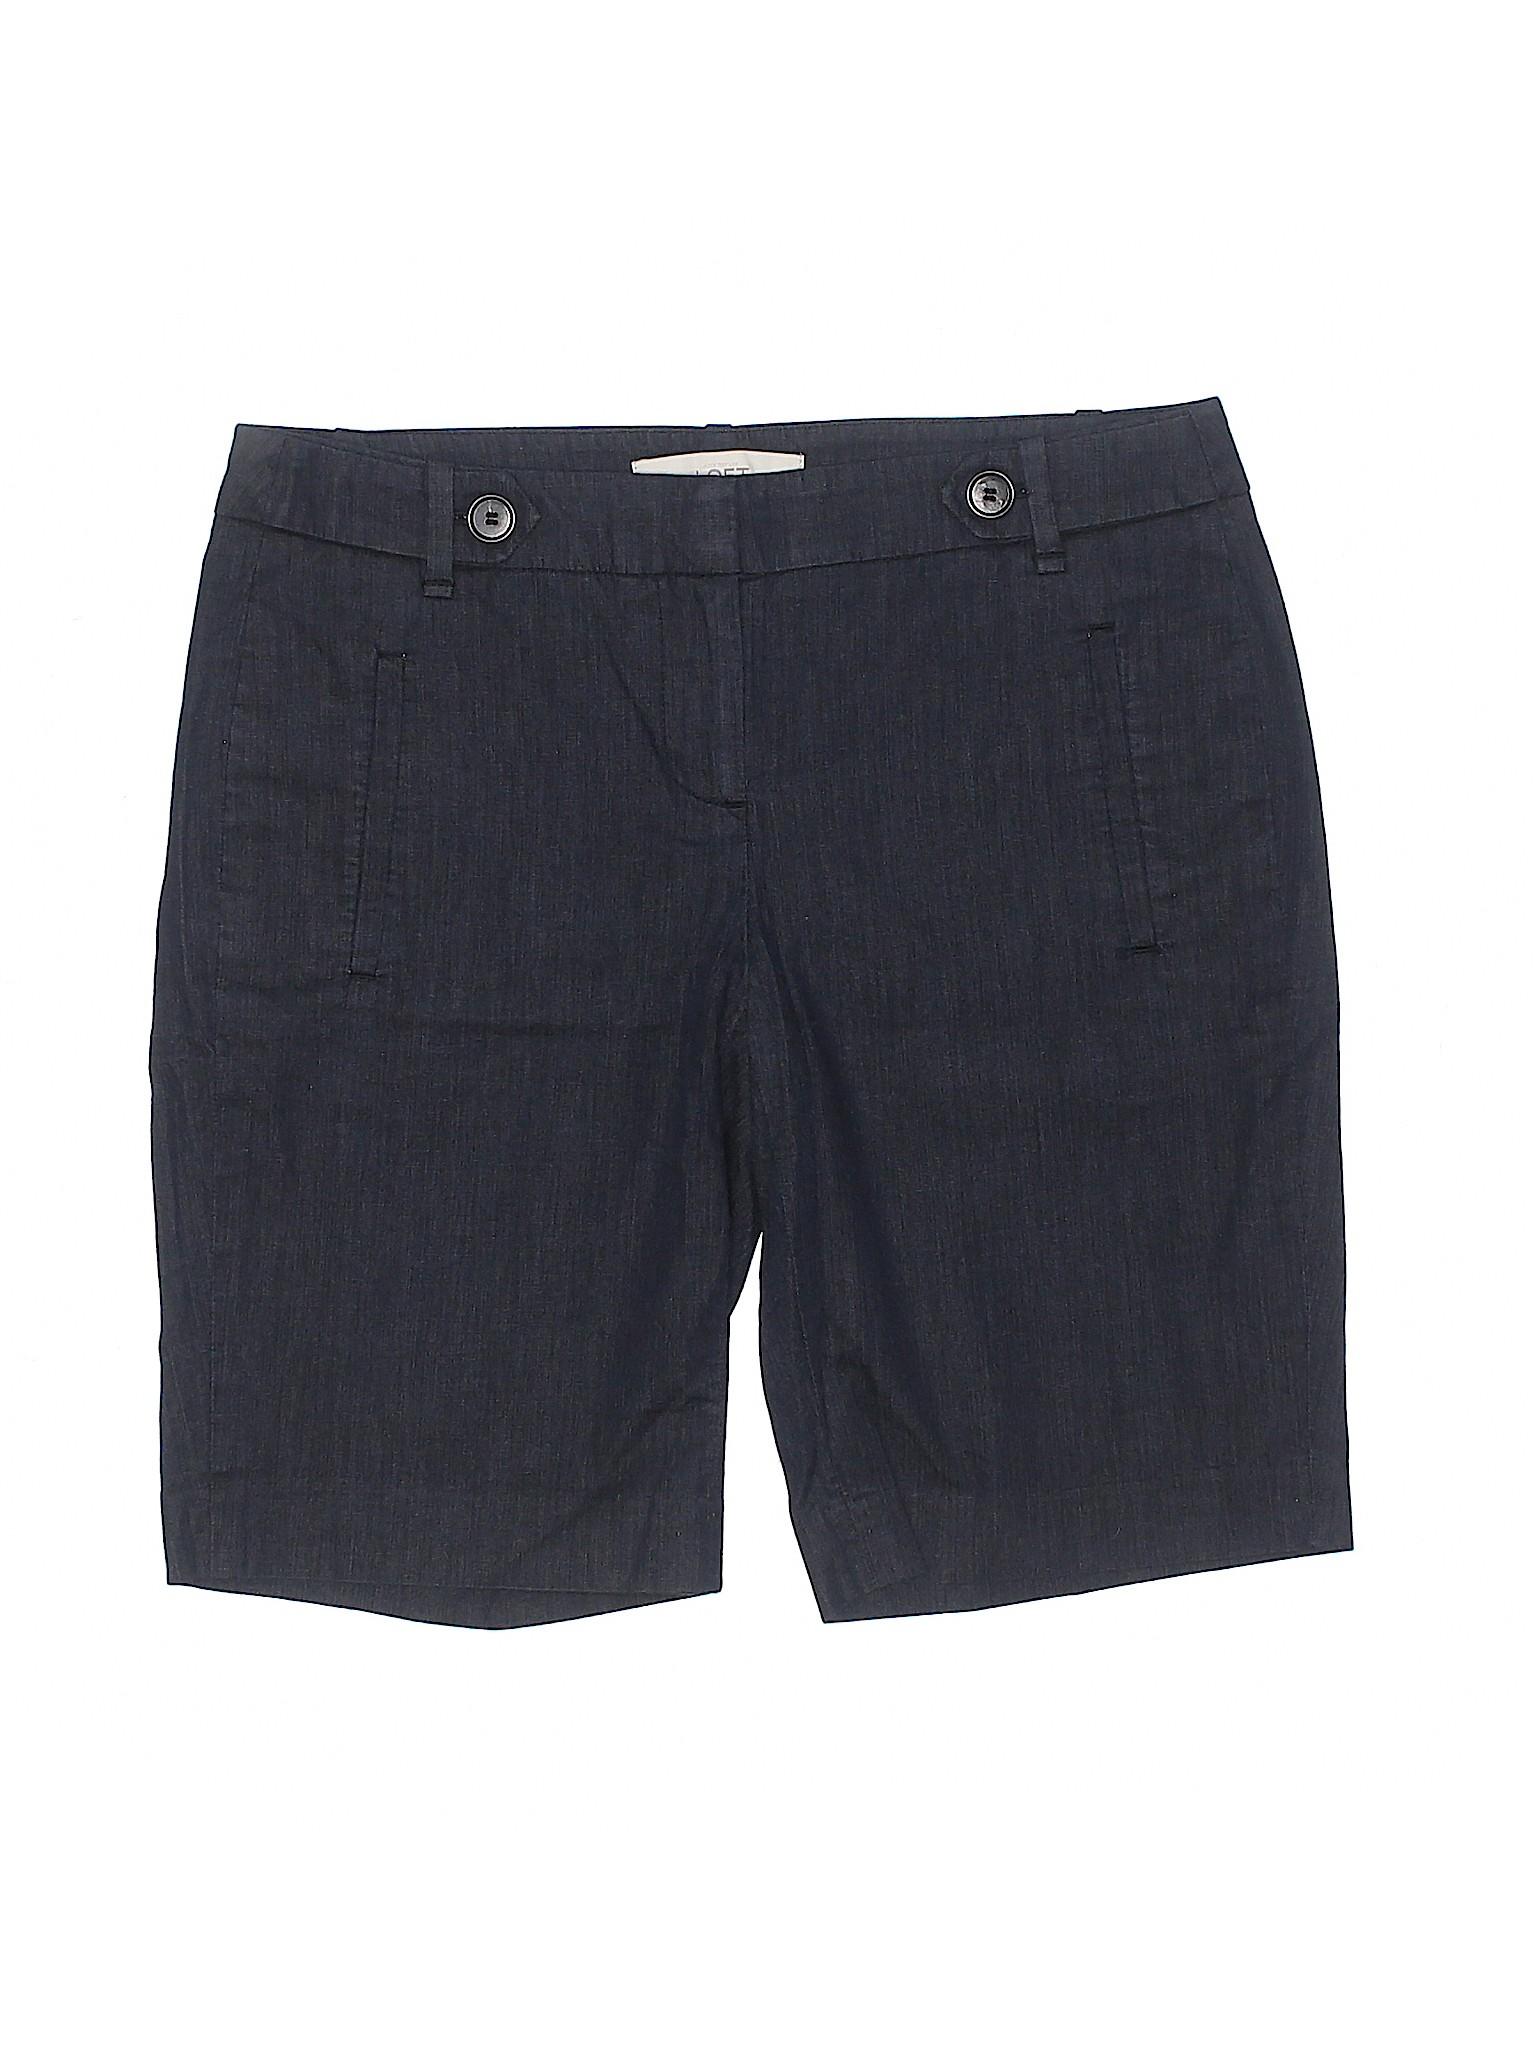 Taylor Dressy LOFT Ann Boutique Shorts F5qwnAxT